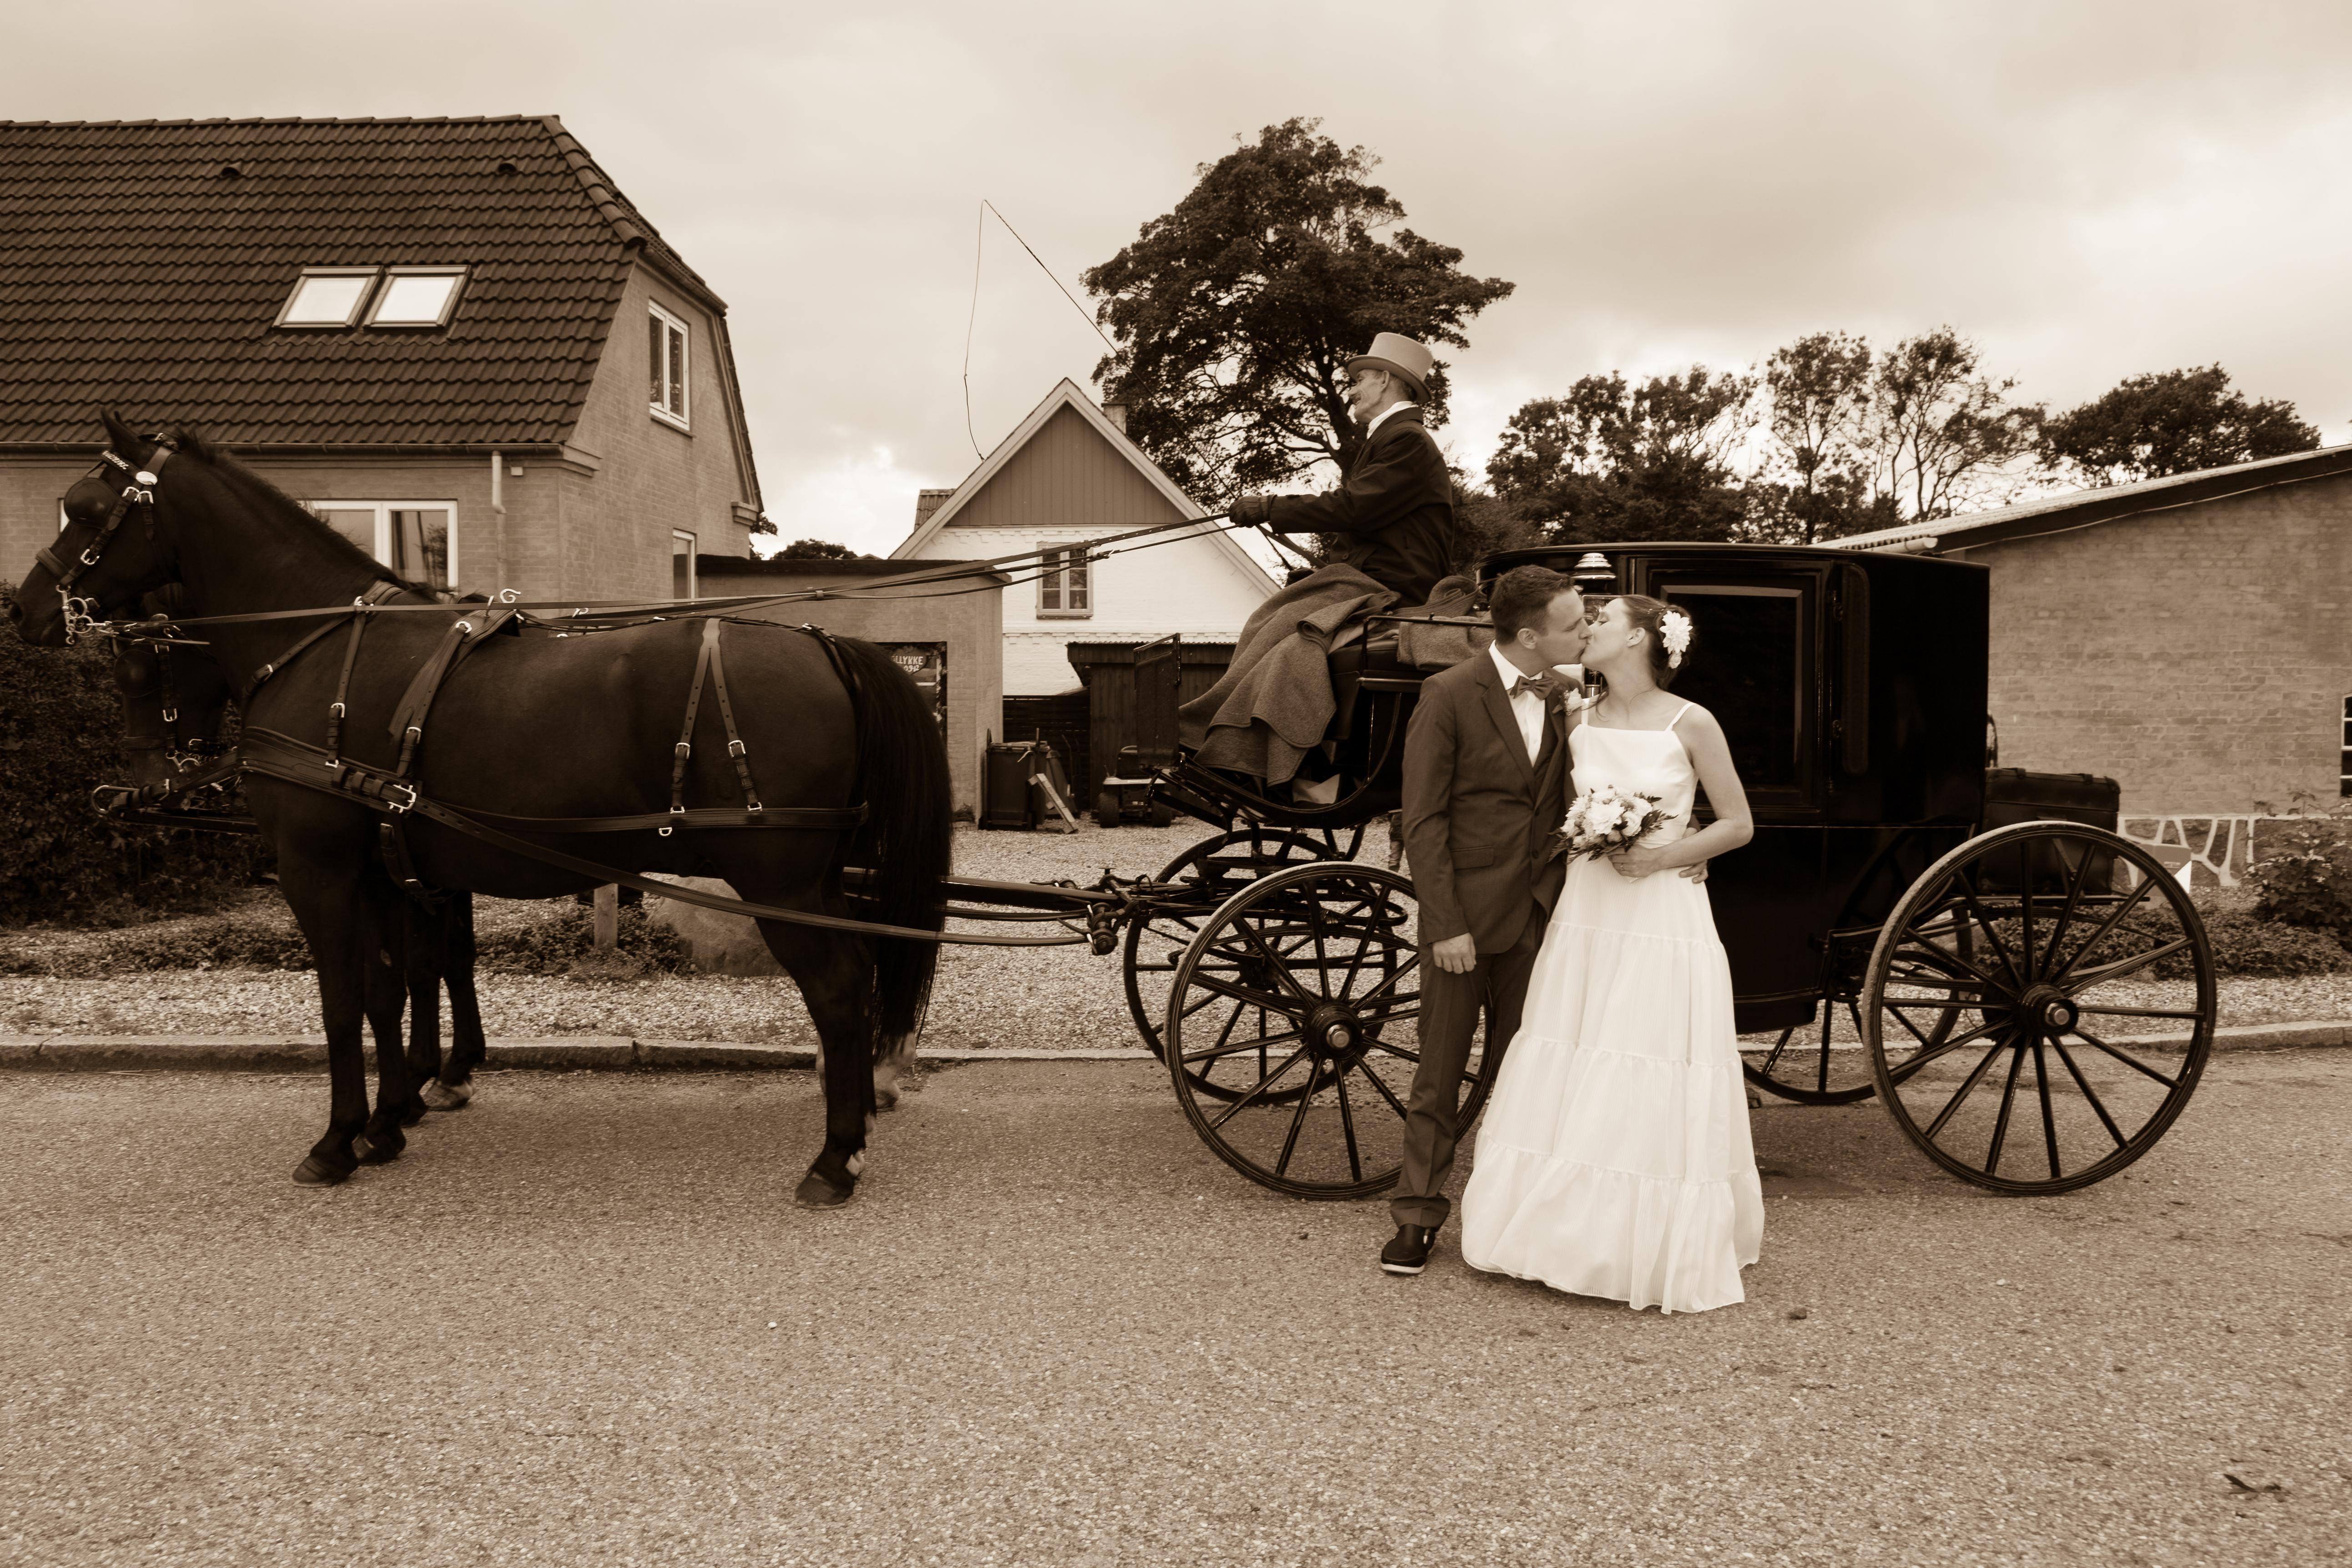 Wedding photo in Sepia